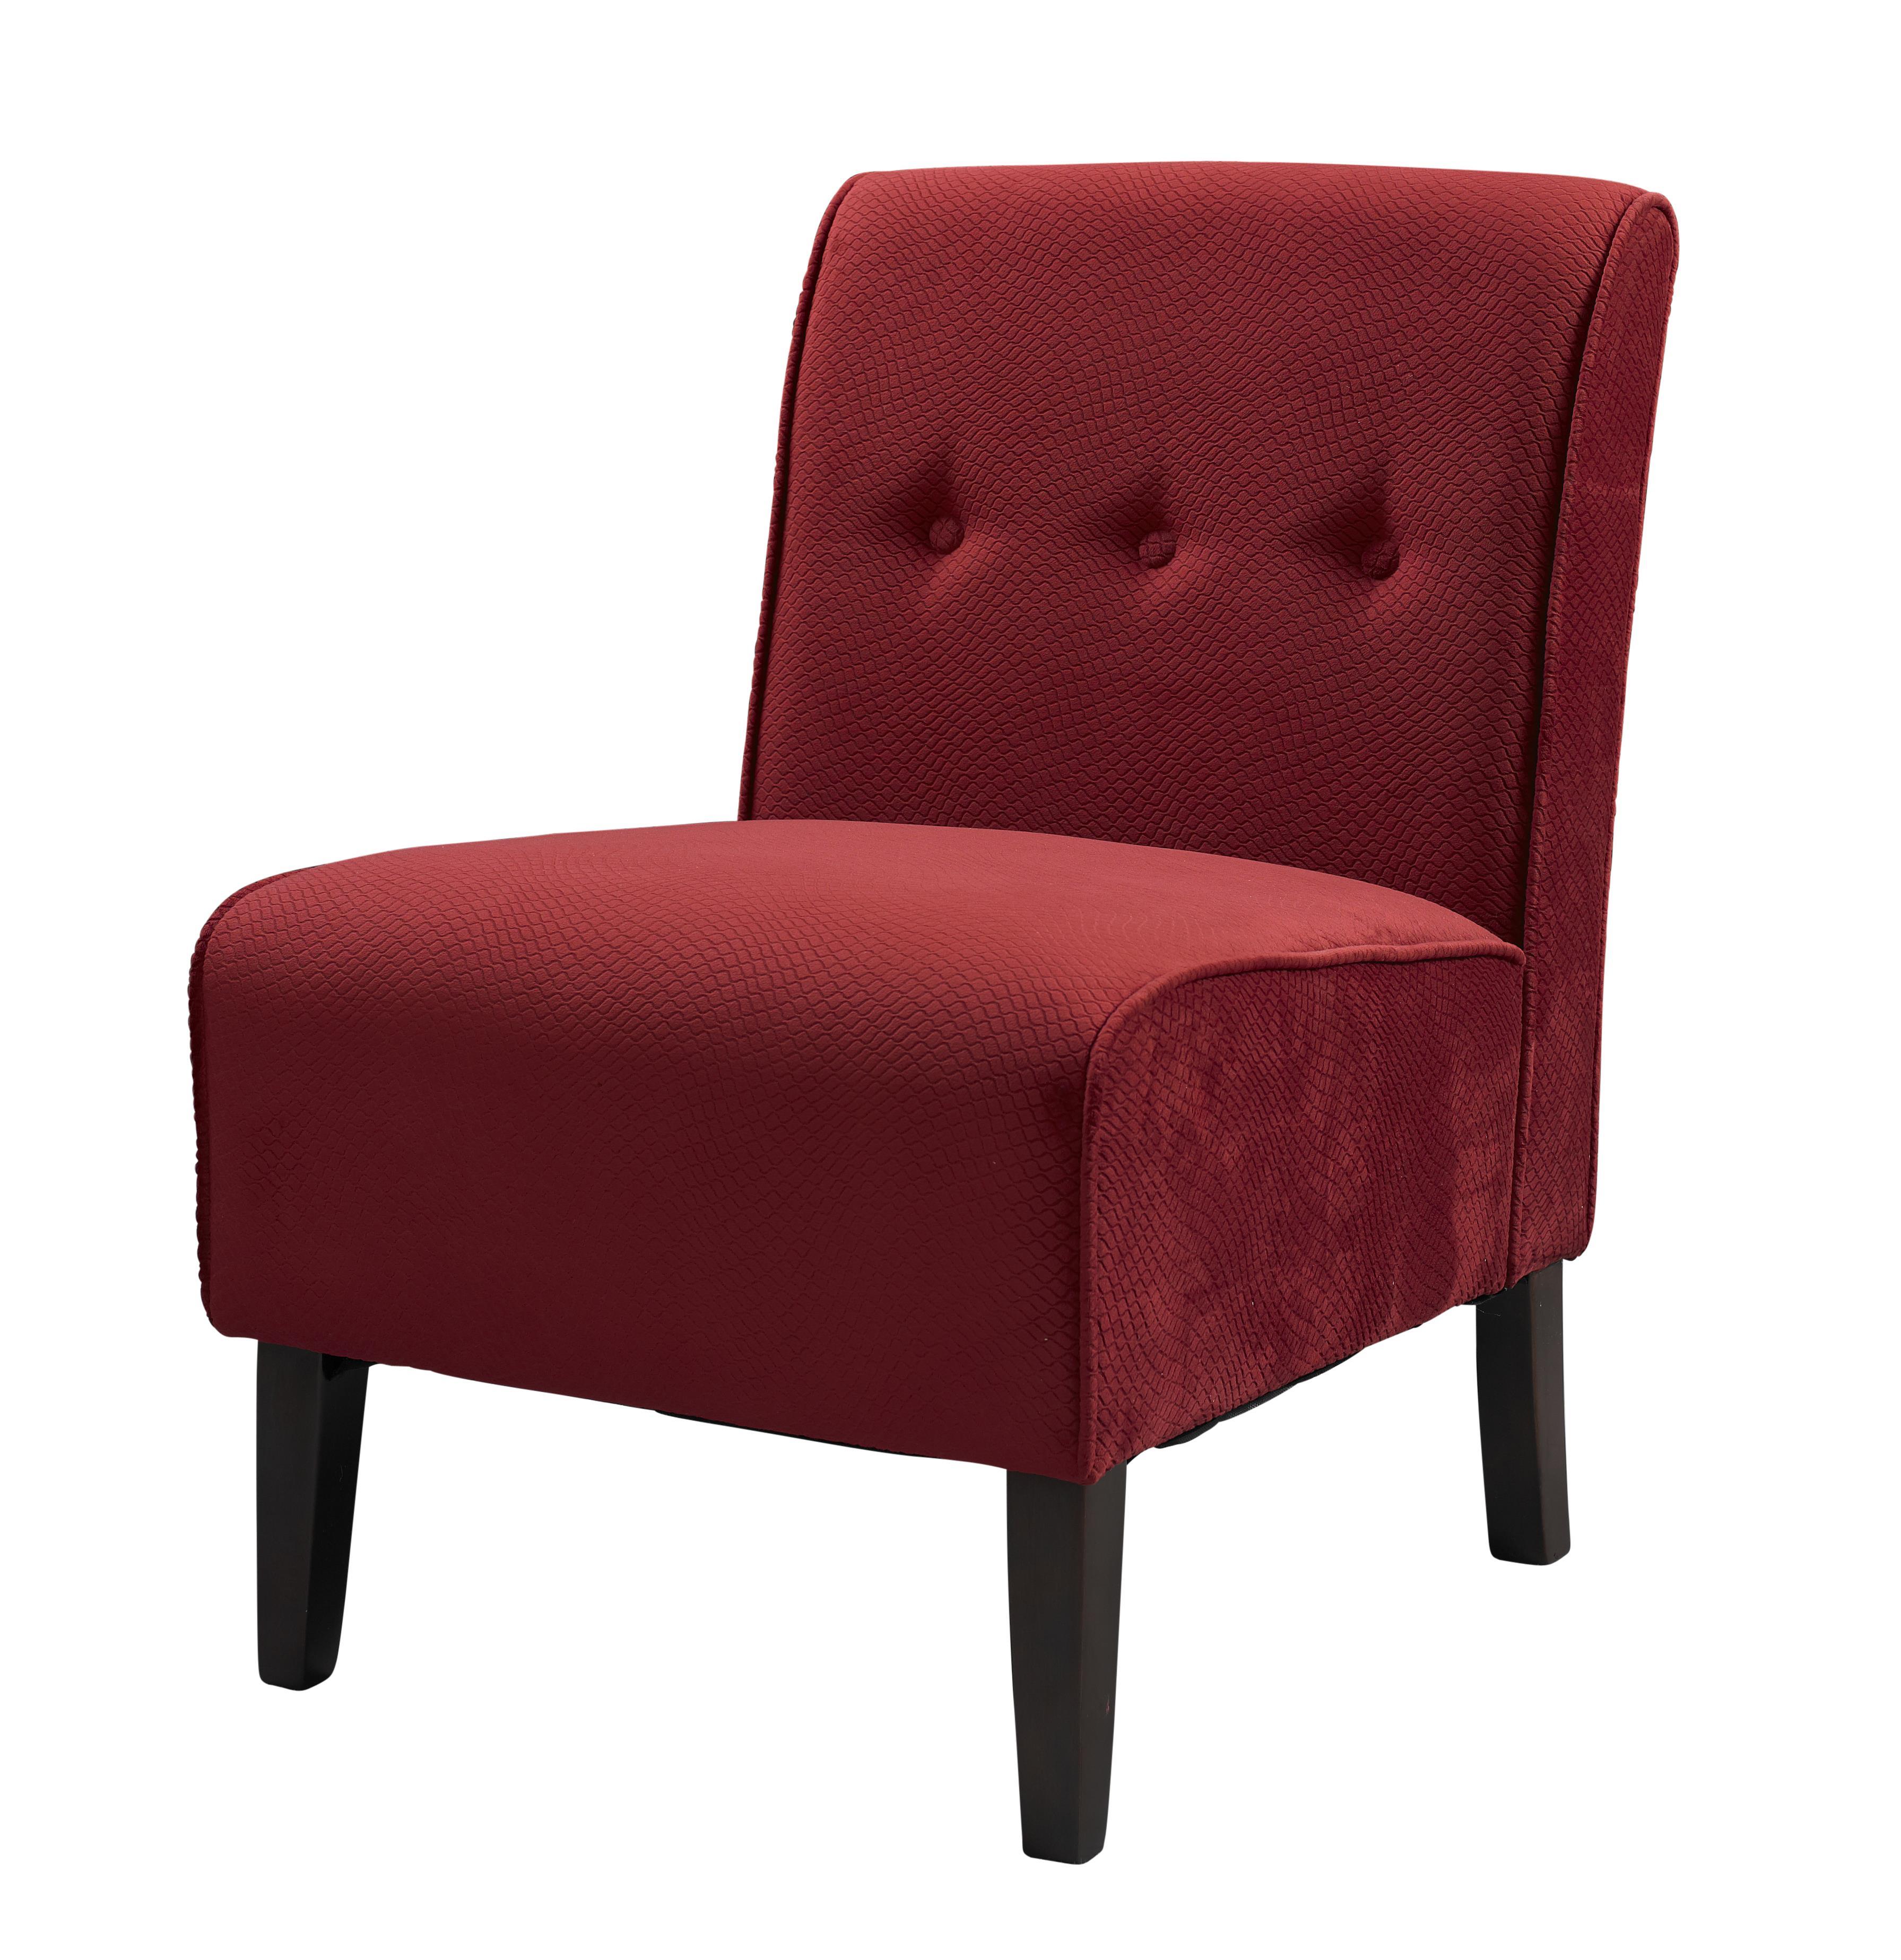 Linon COCO ACCENT CHAIR Red